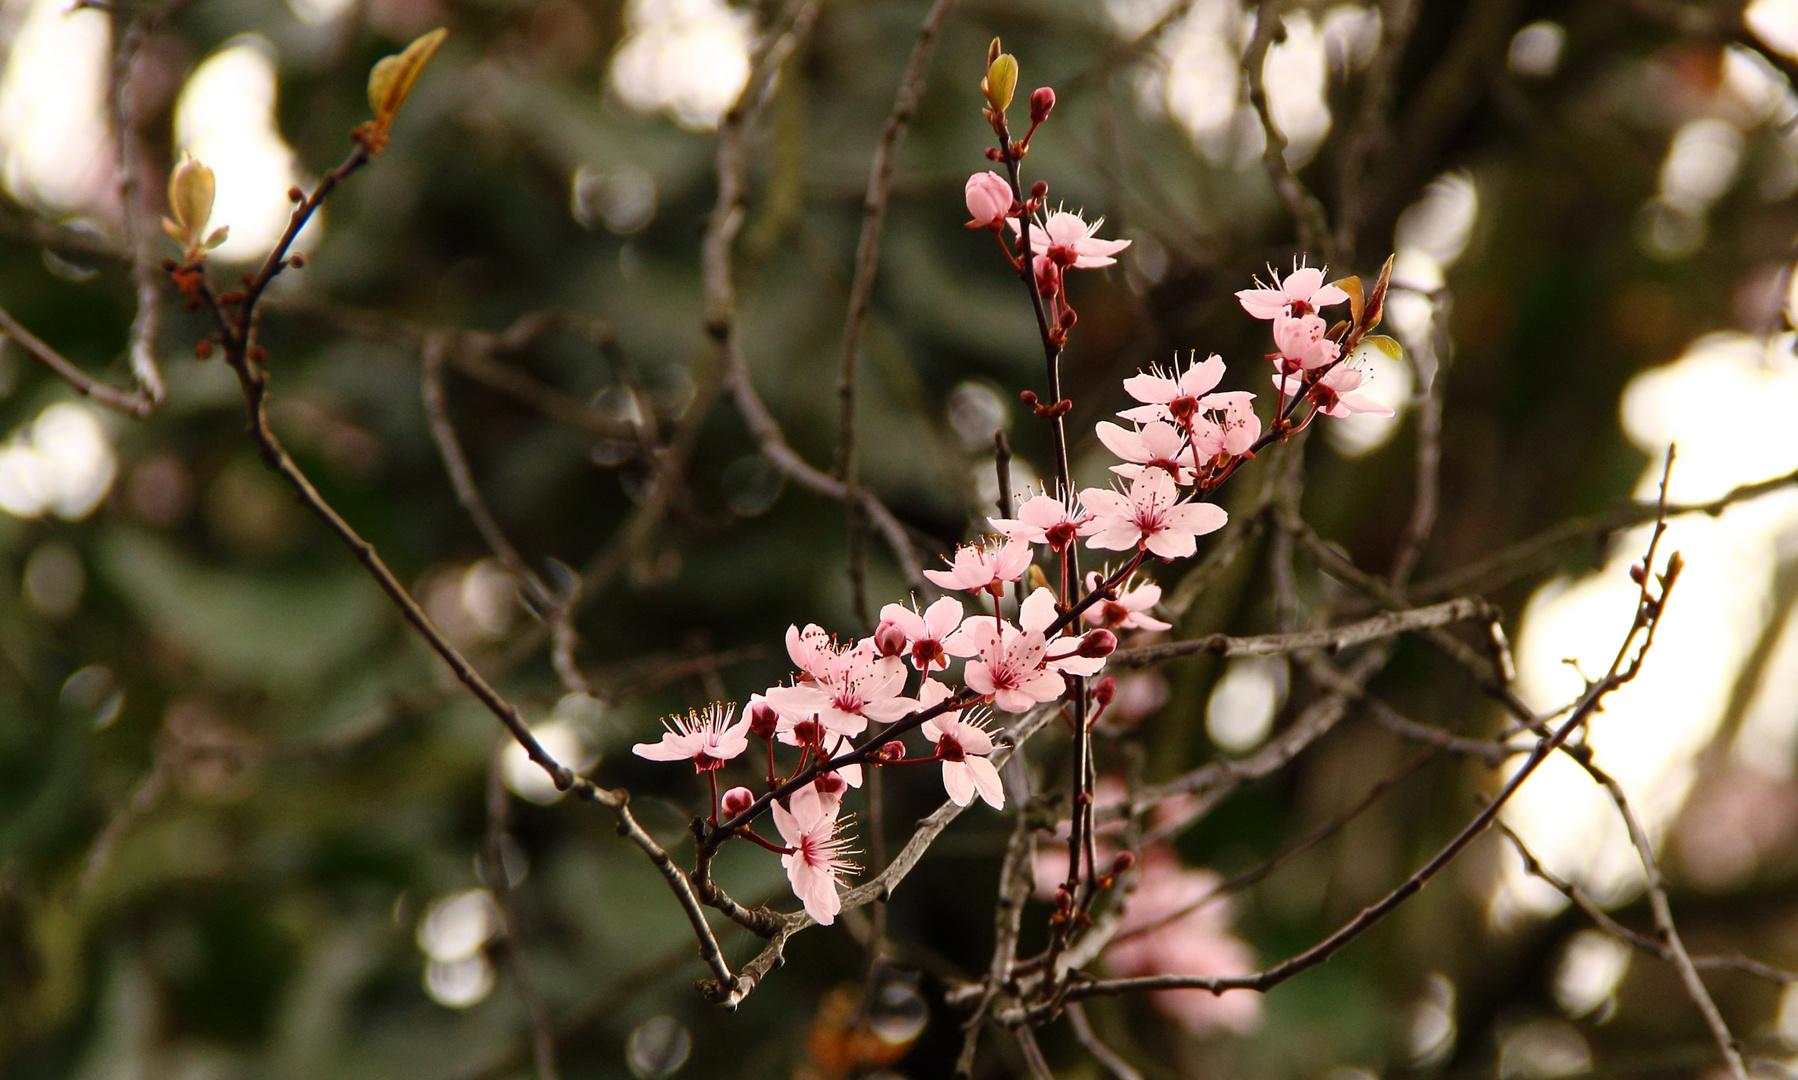 ...romantischer Frühlingsnachmittag!